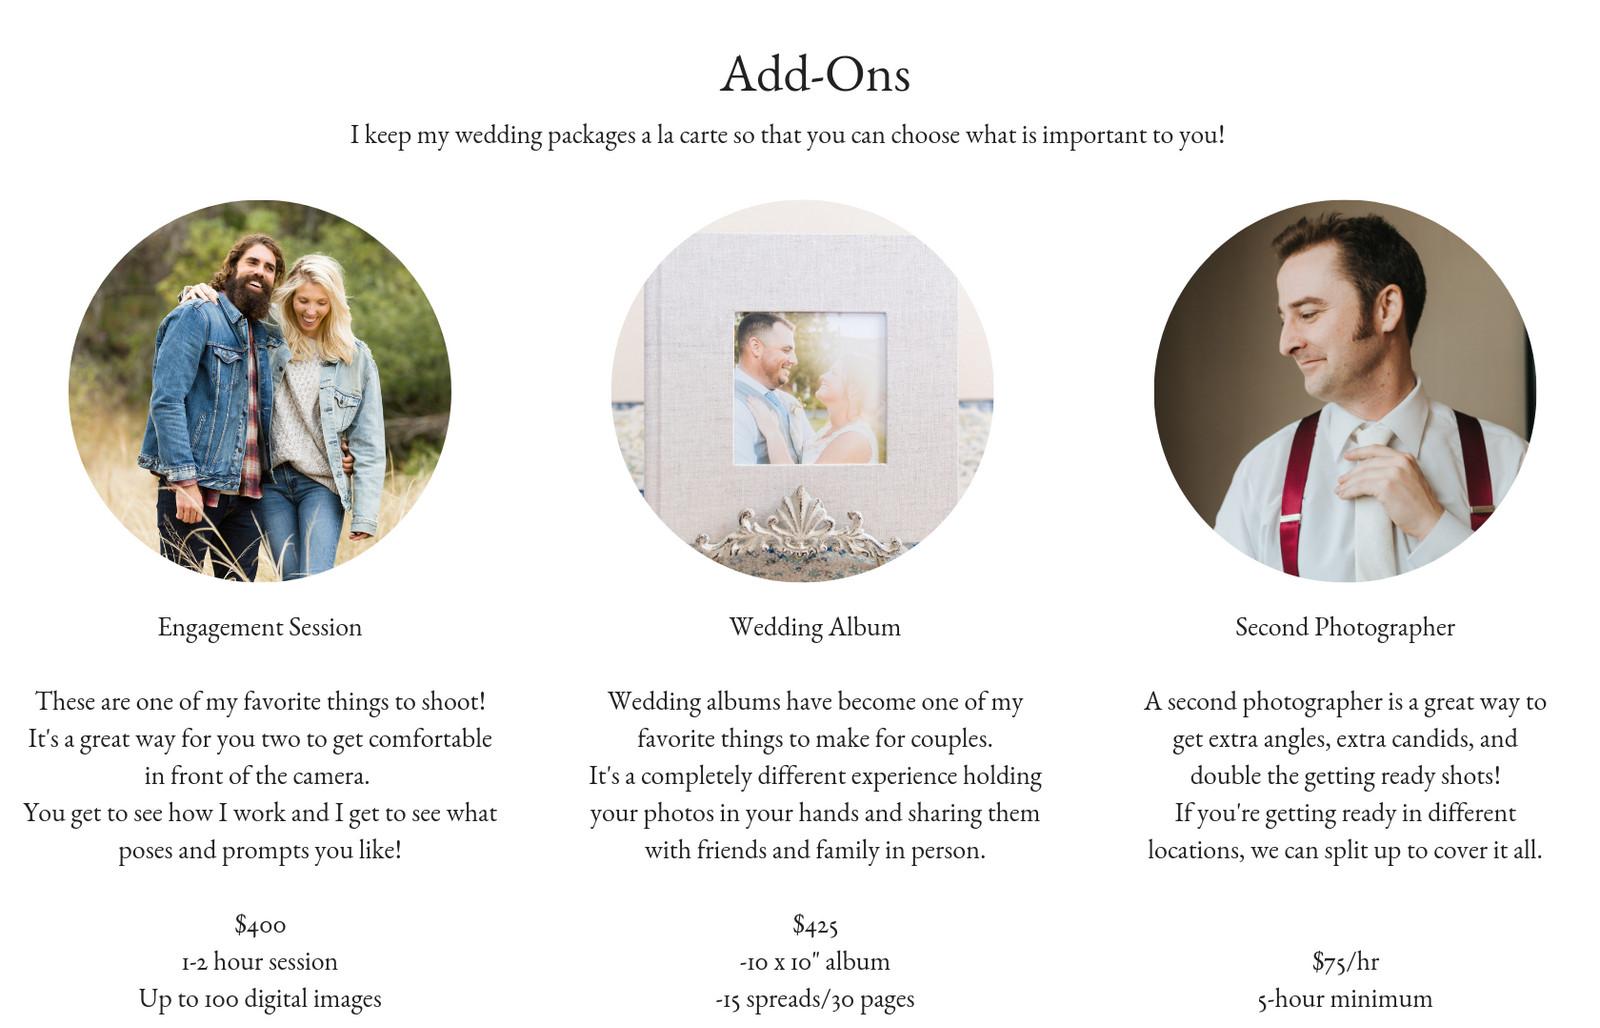 kelseyhaleymedia | Wedding Guide 18/19